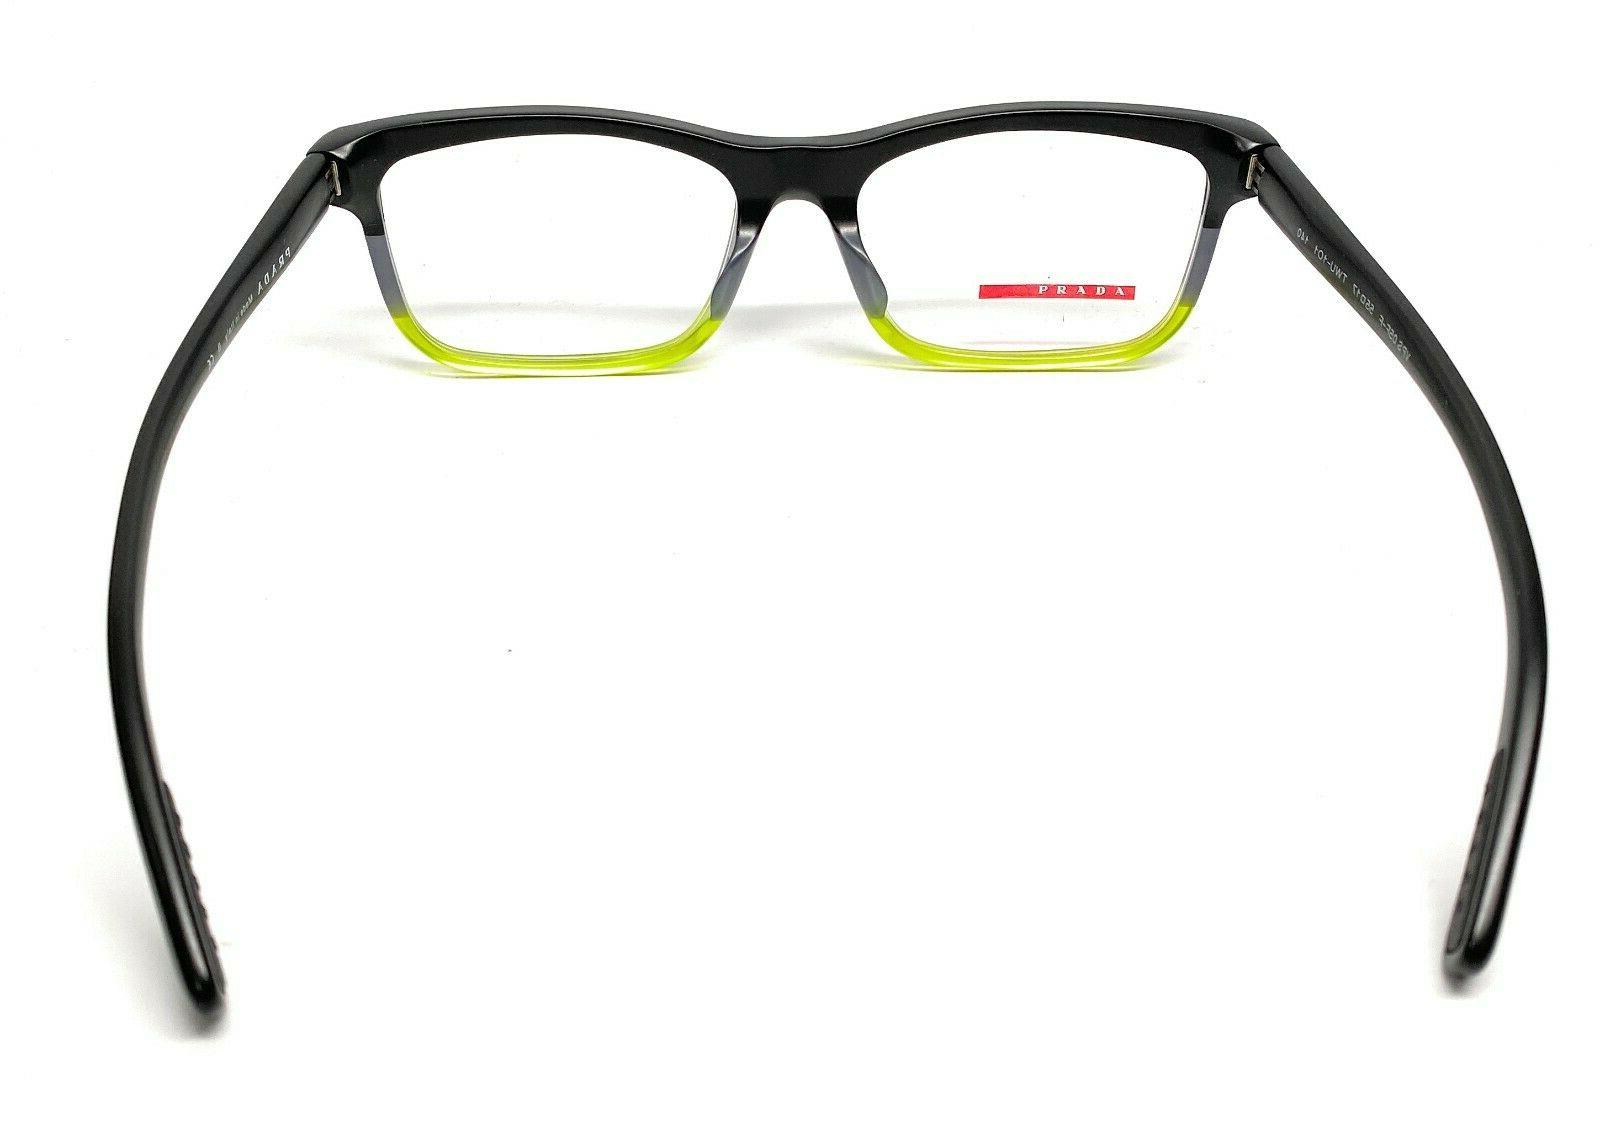 New TWU-1O1 Eyeglasses